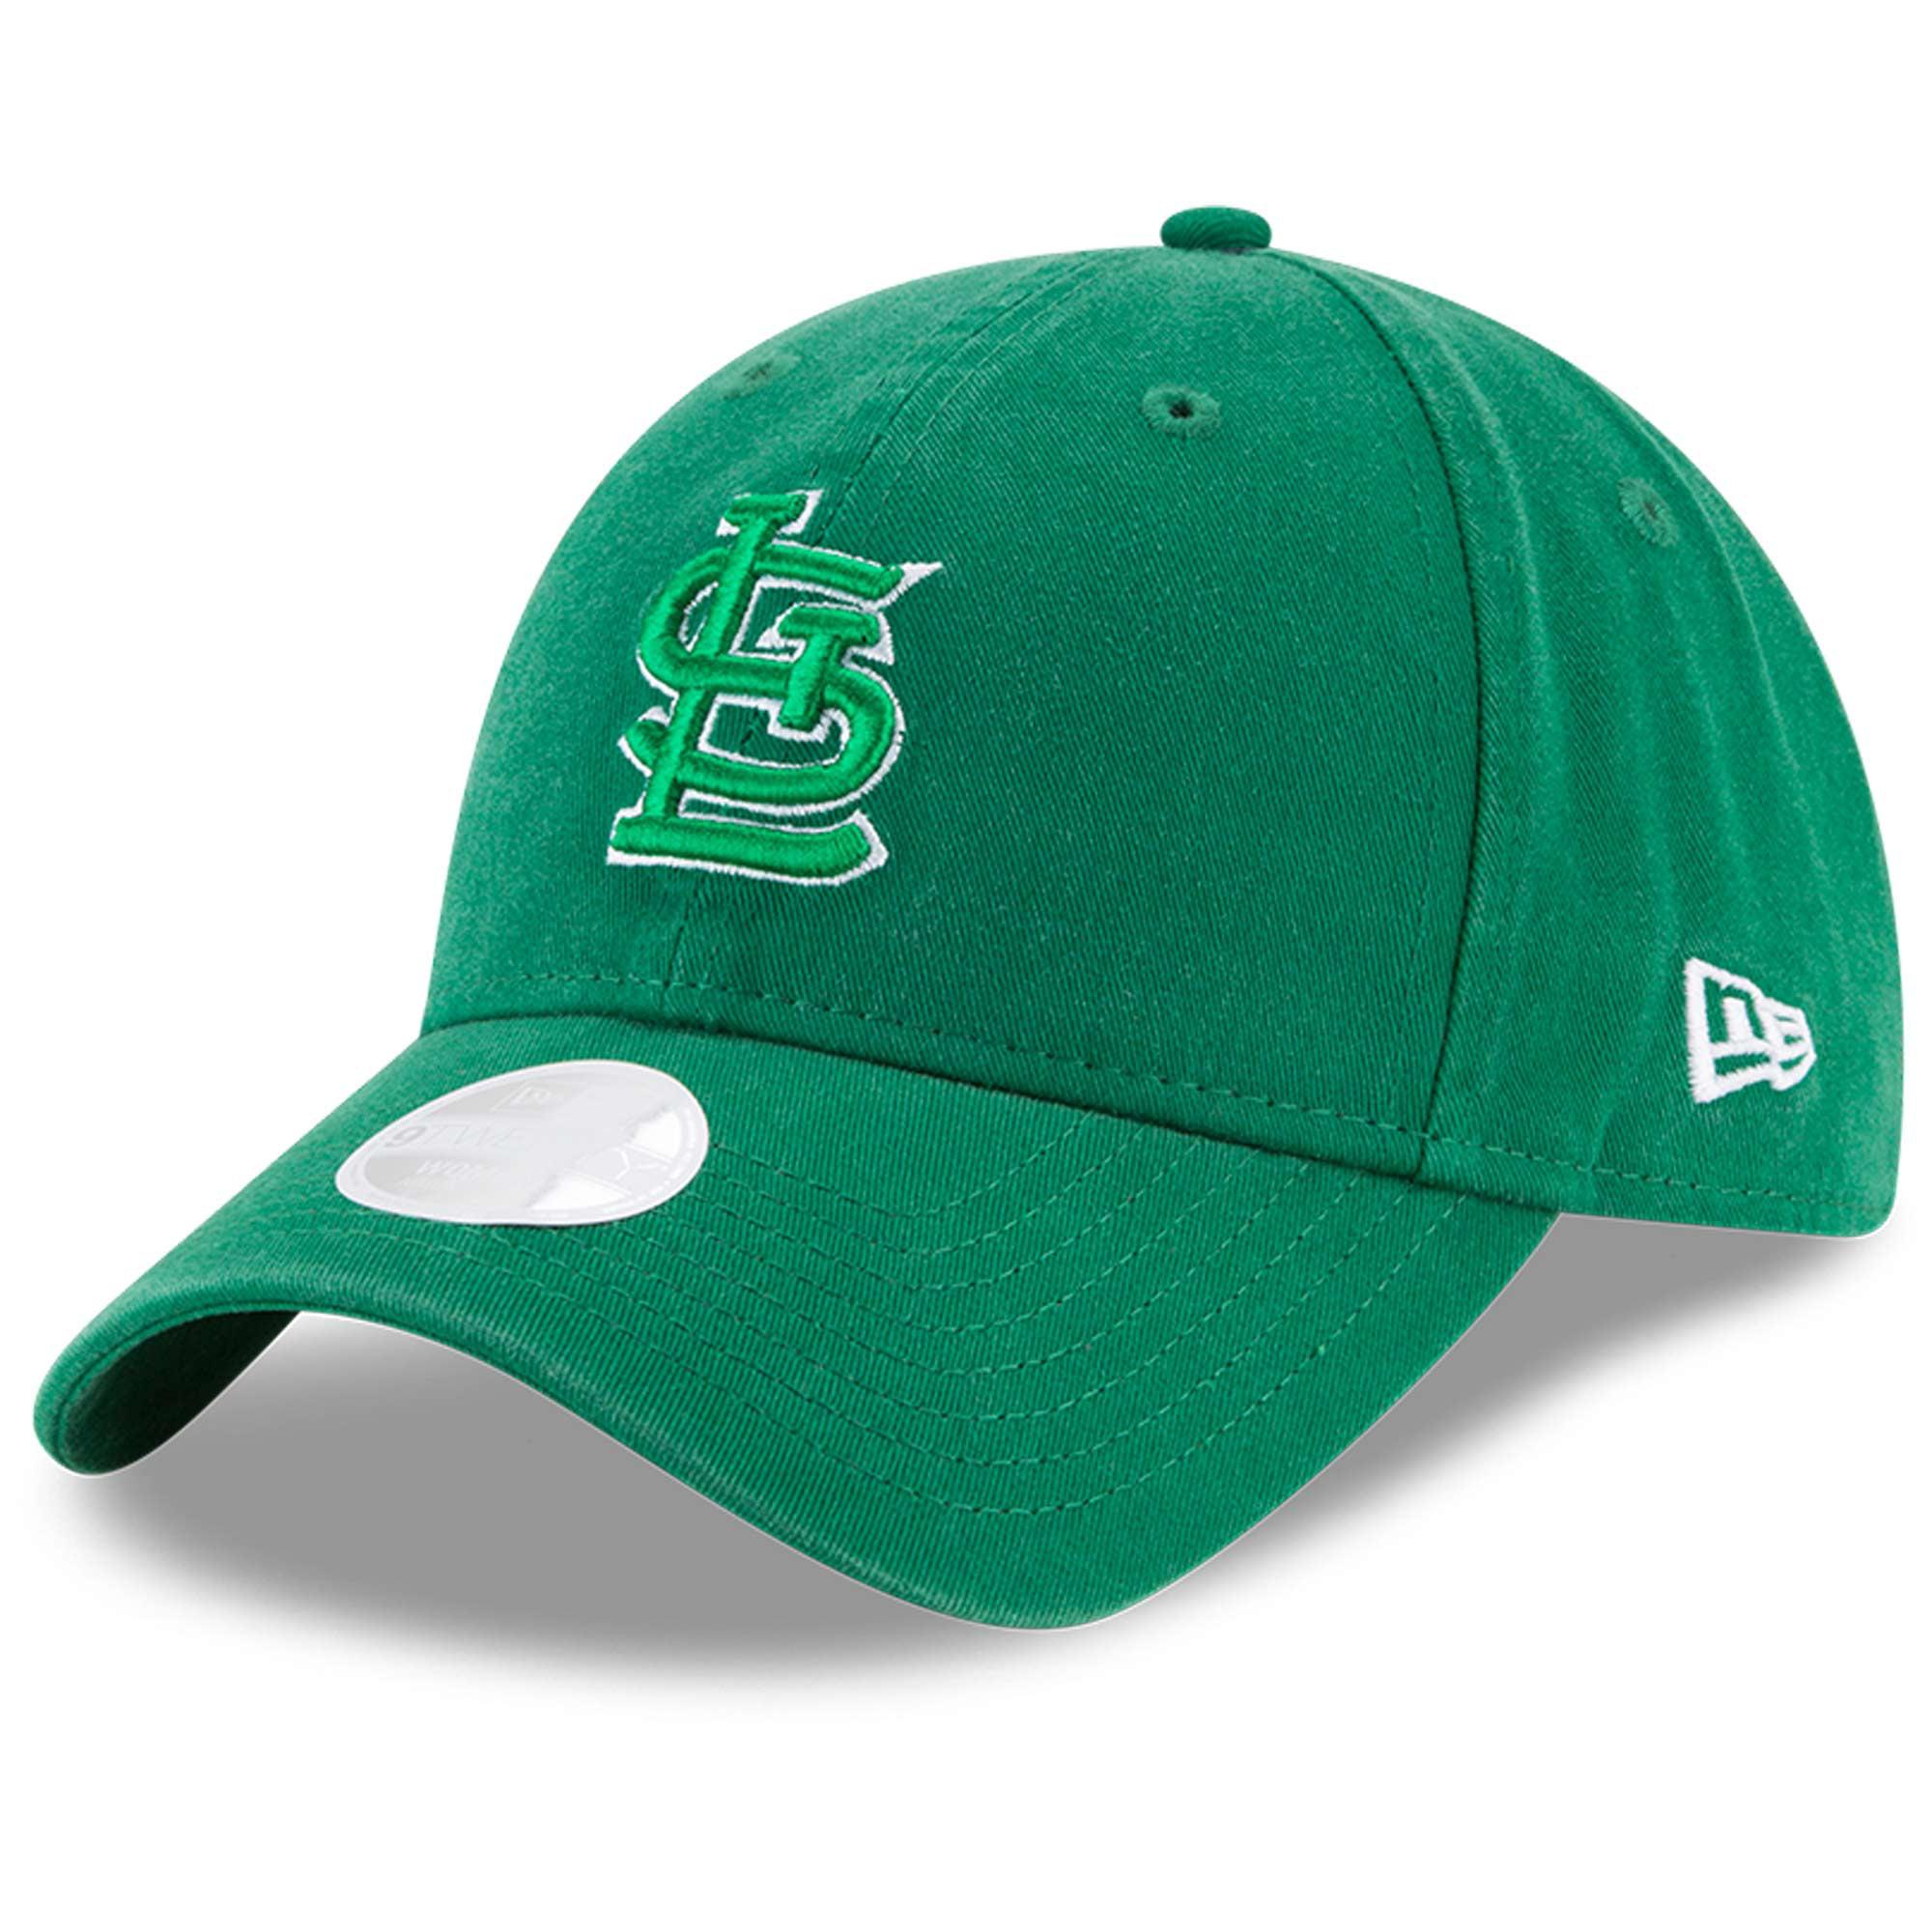 St. Louis Cardinals New Era Women's Core Classic Twill St. Patrick's Day 9TWENTY Adjustable Hat - Green - OSFA